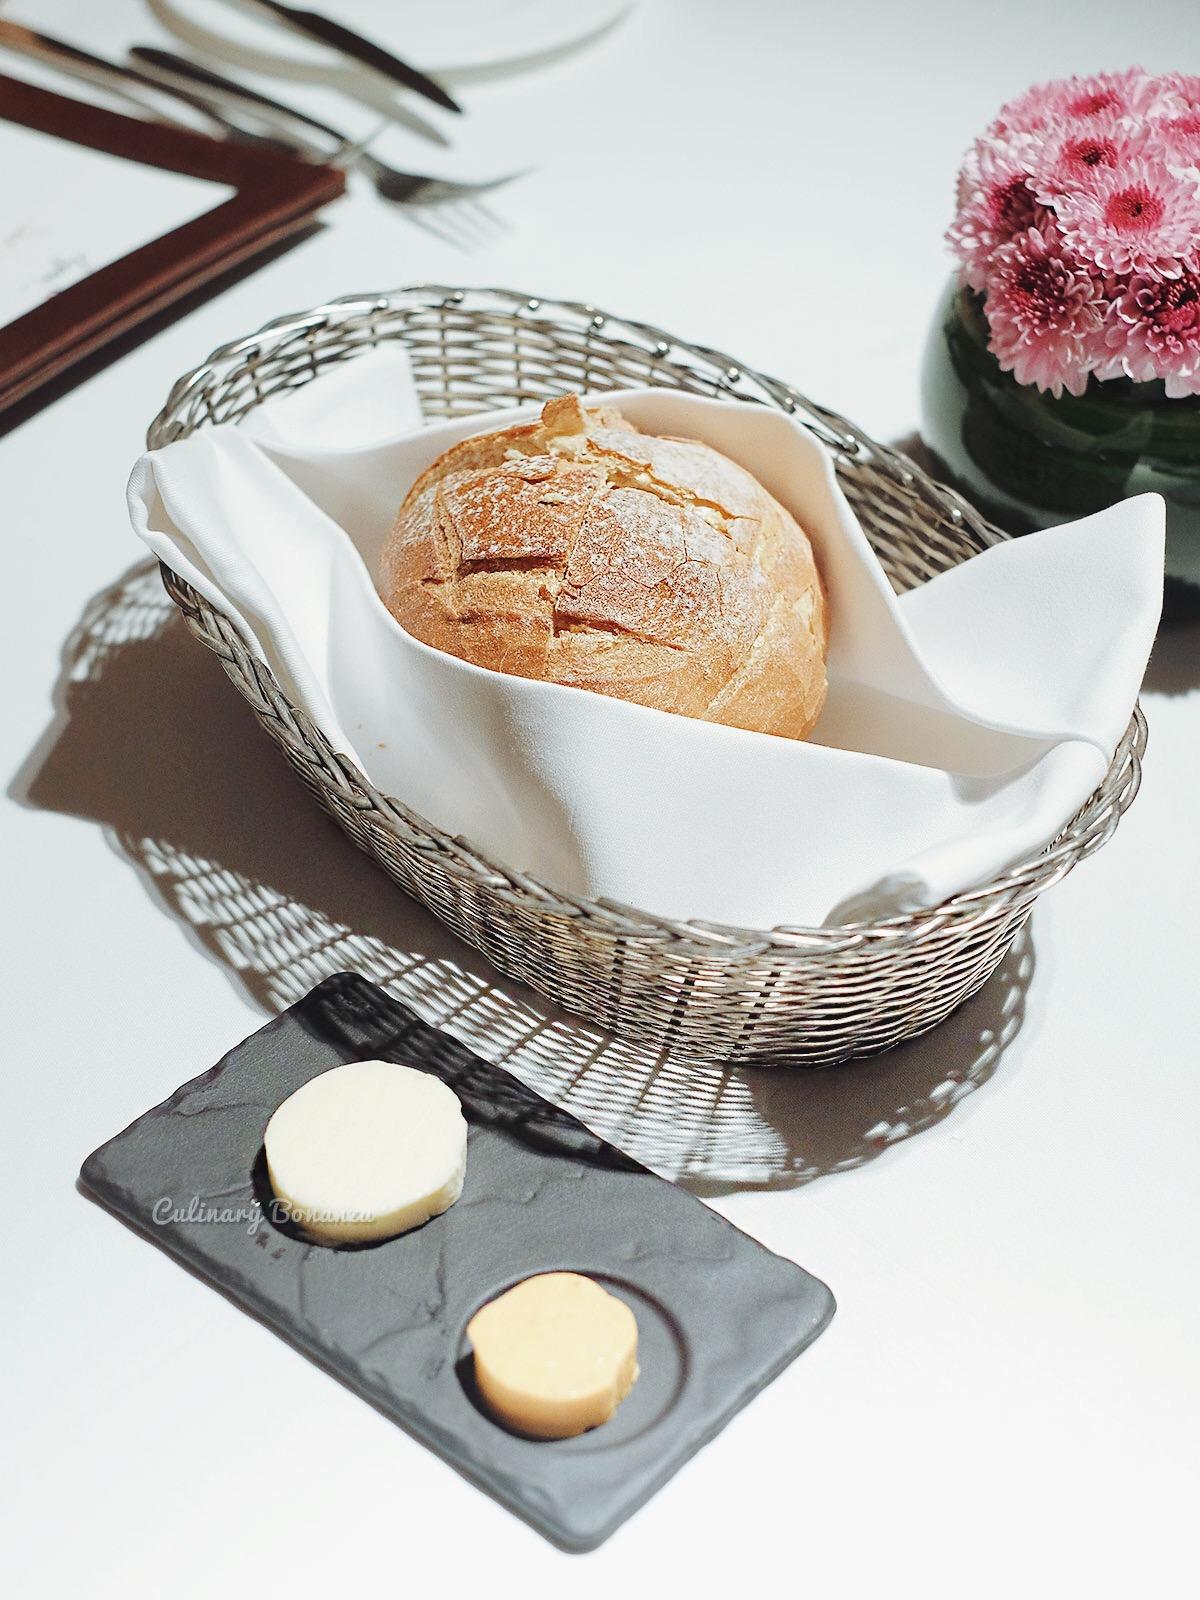 Lyon french restaurant at mandarin oriental jakarta (www.culinarybonanza.com)